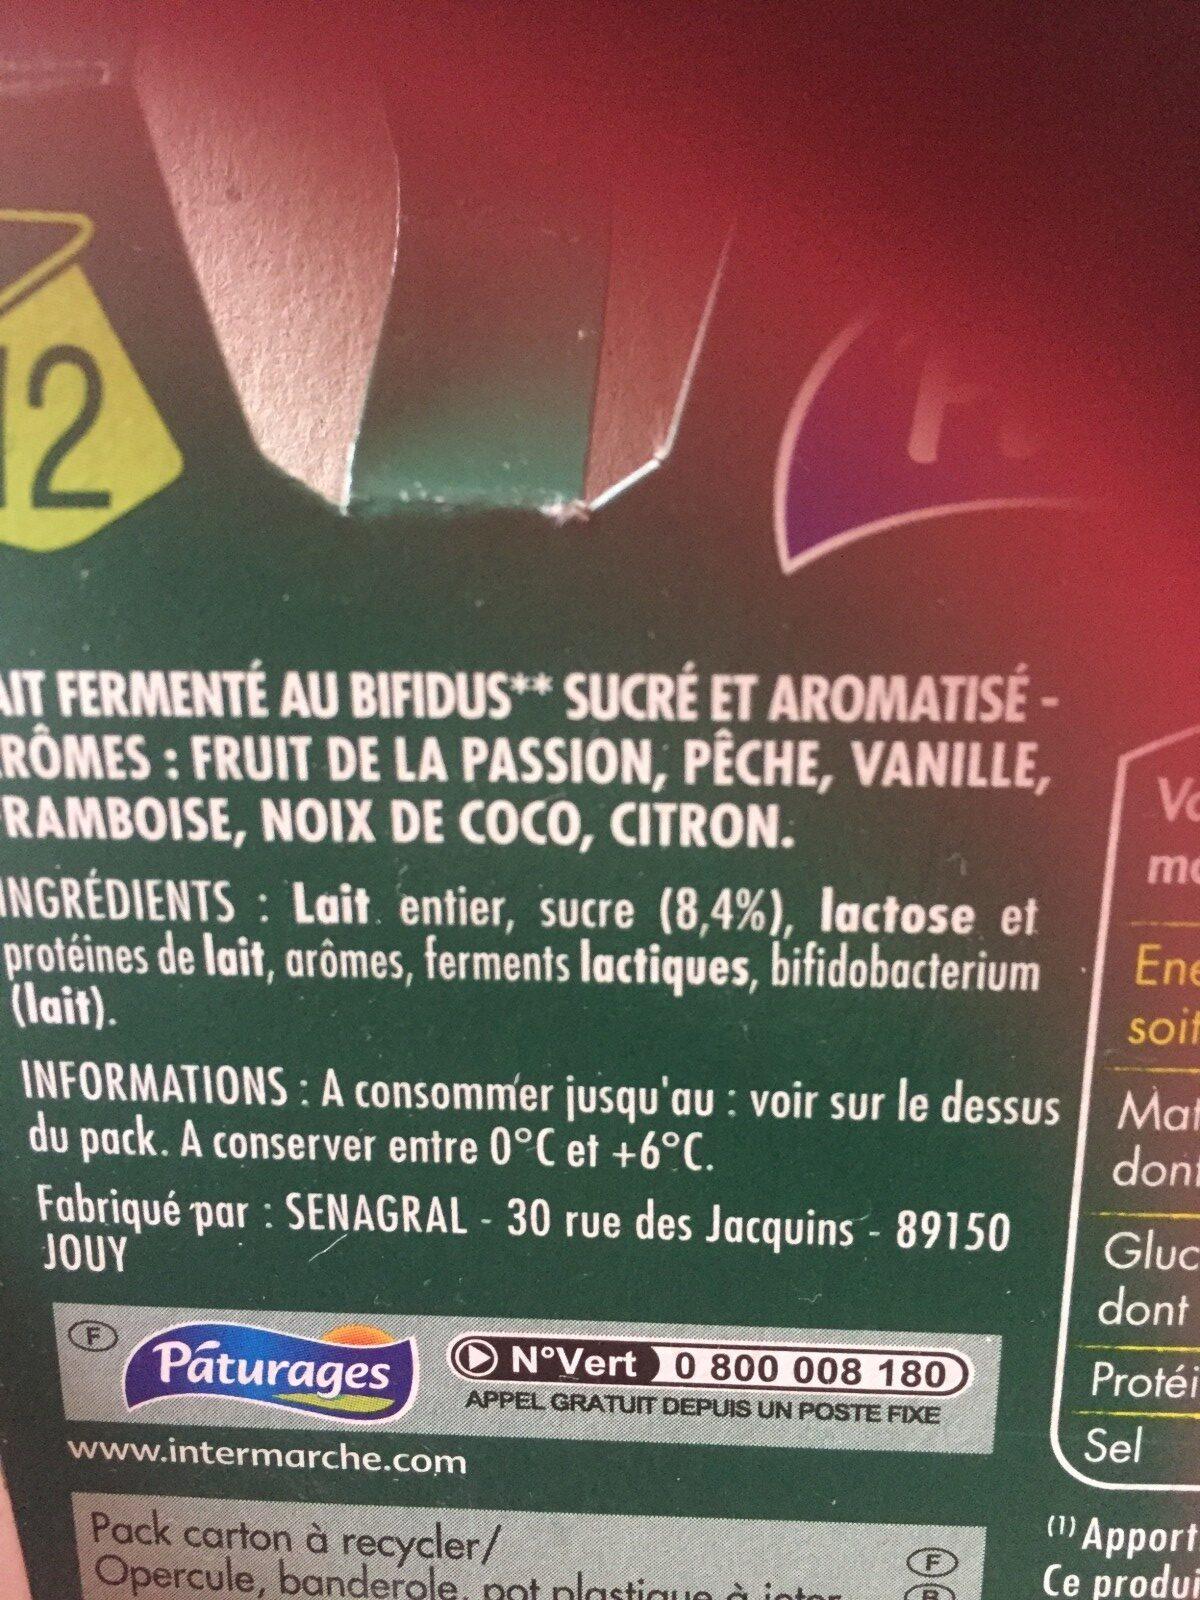 Bifidus aromatisés Paturages - Ingredients - fr